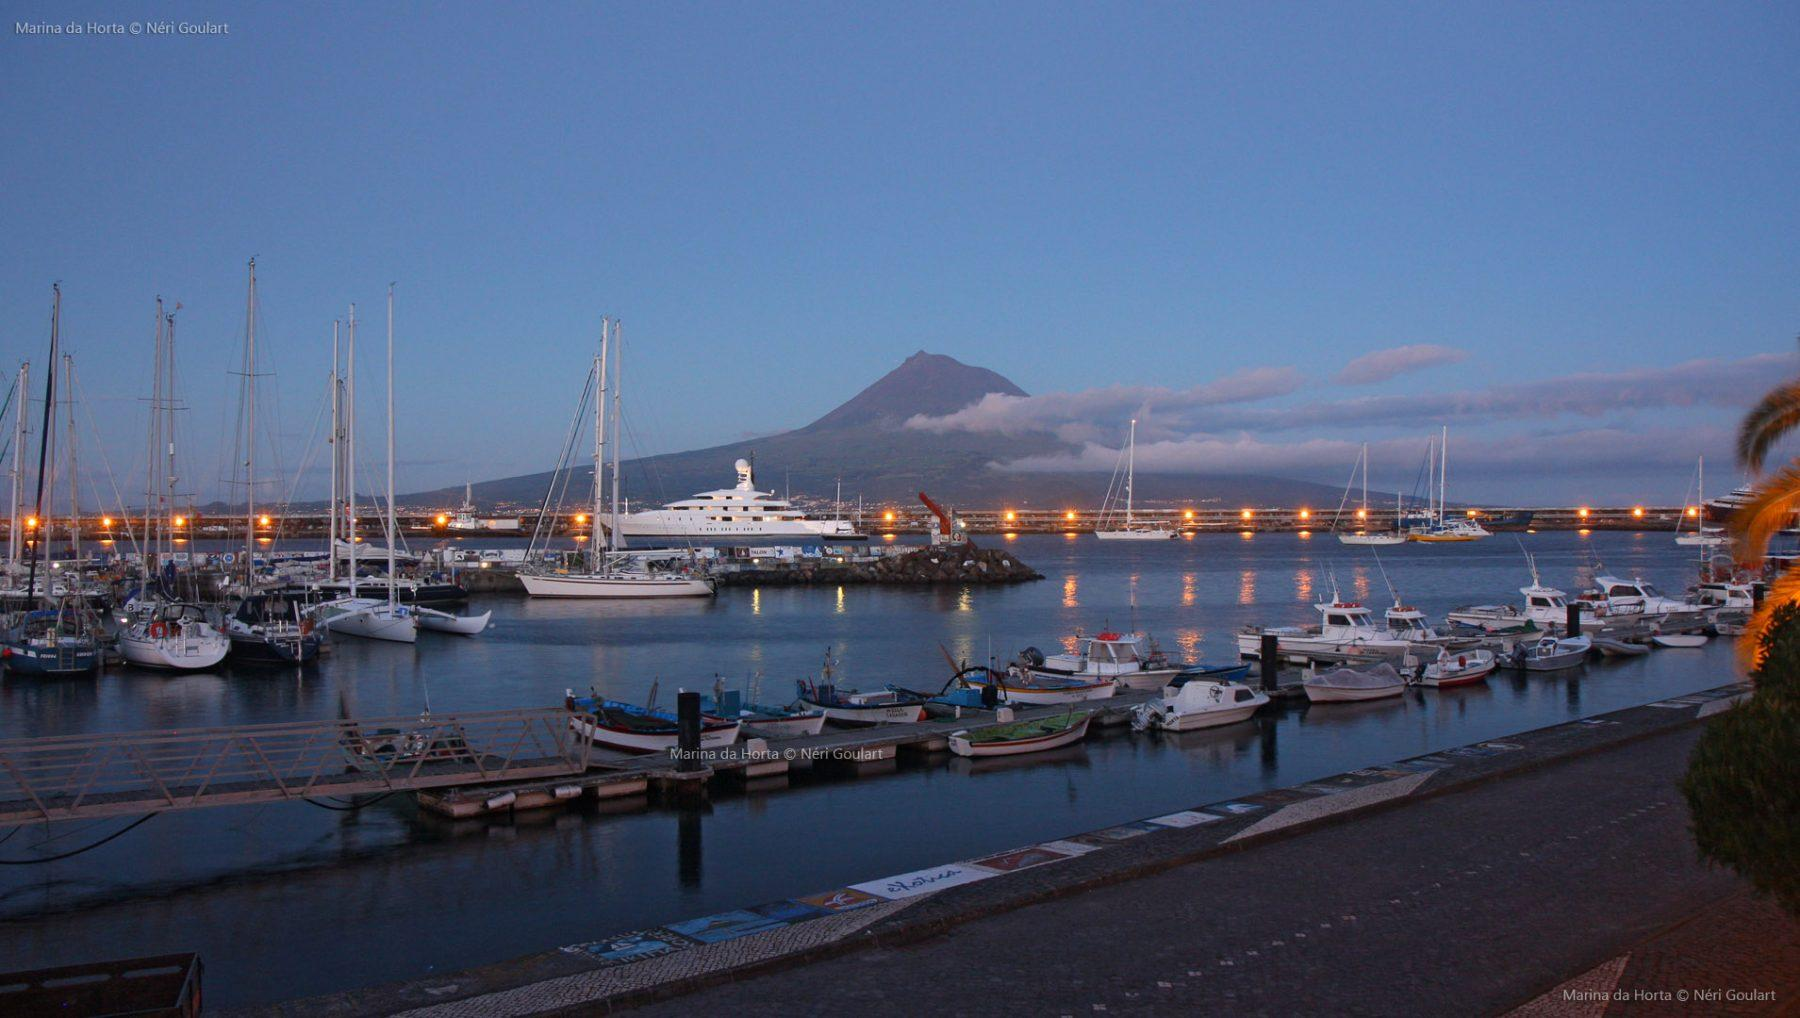 Marina da Horta, Ilha do Faial, Açores